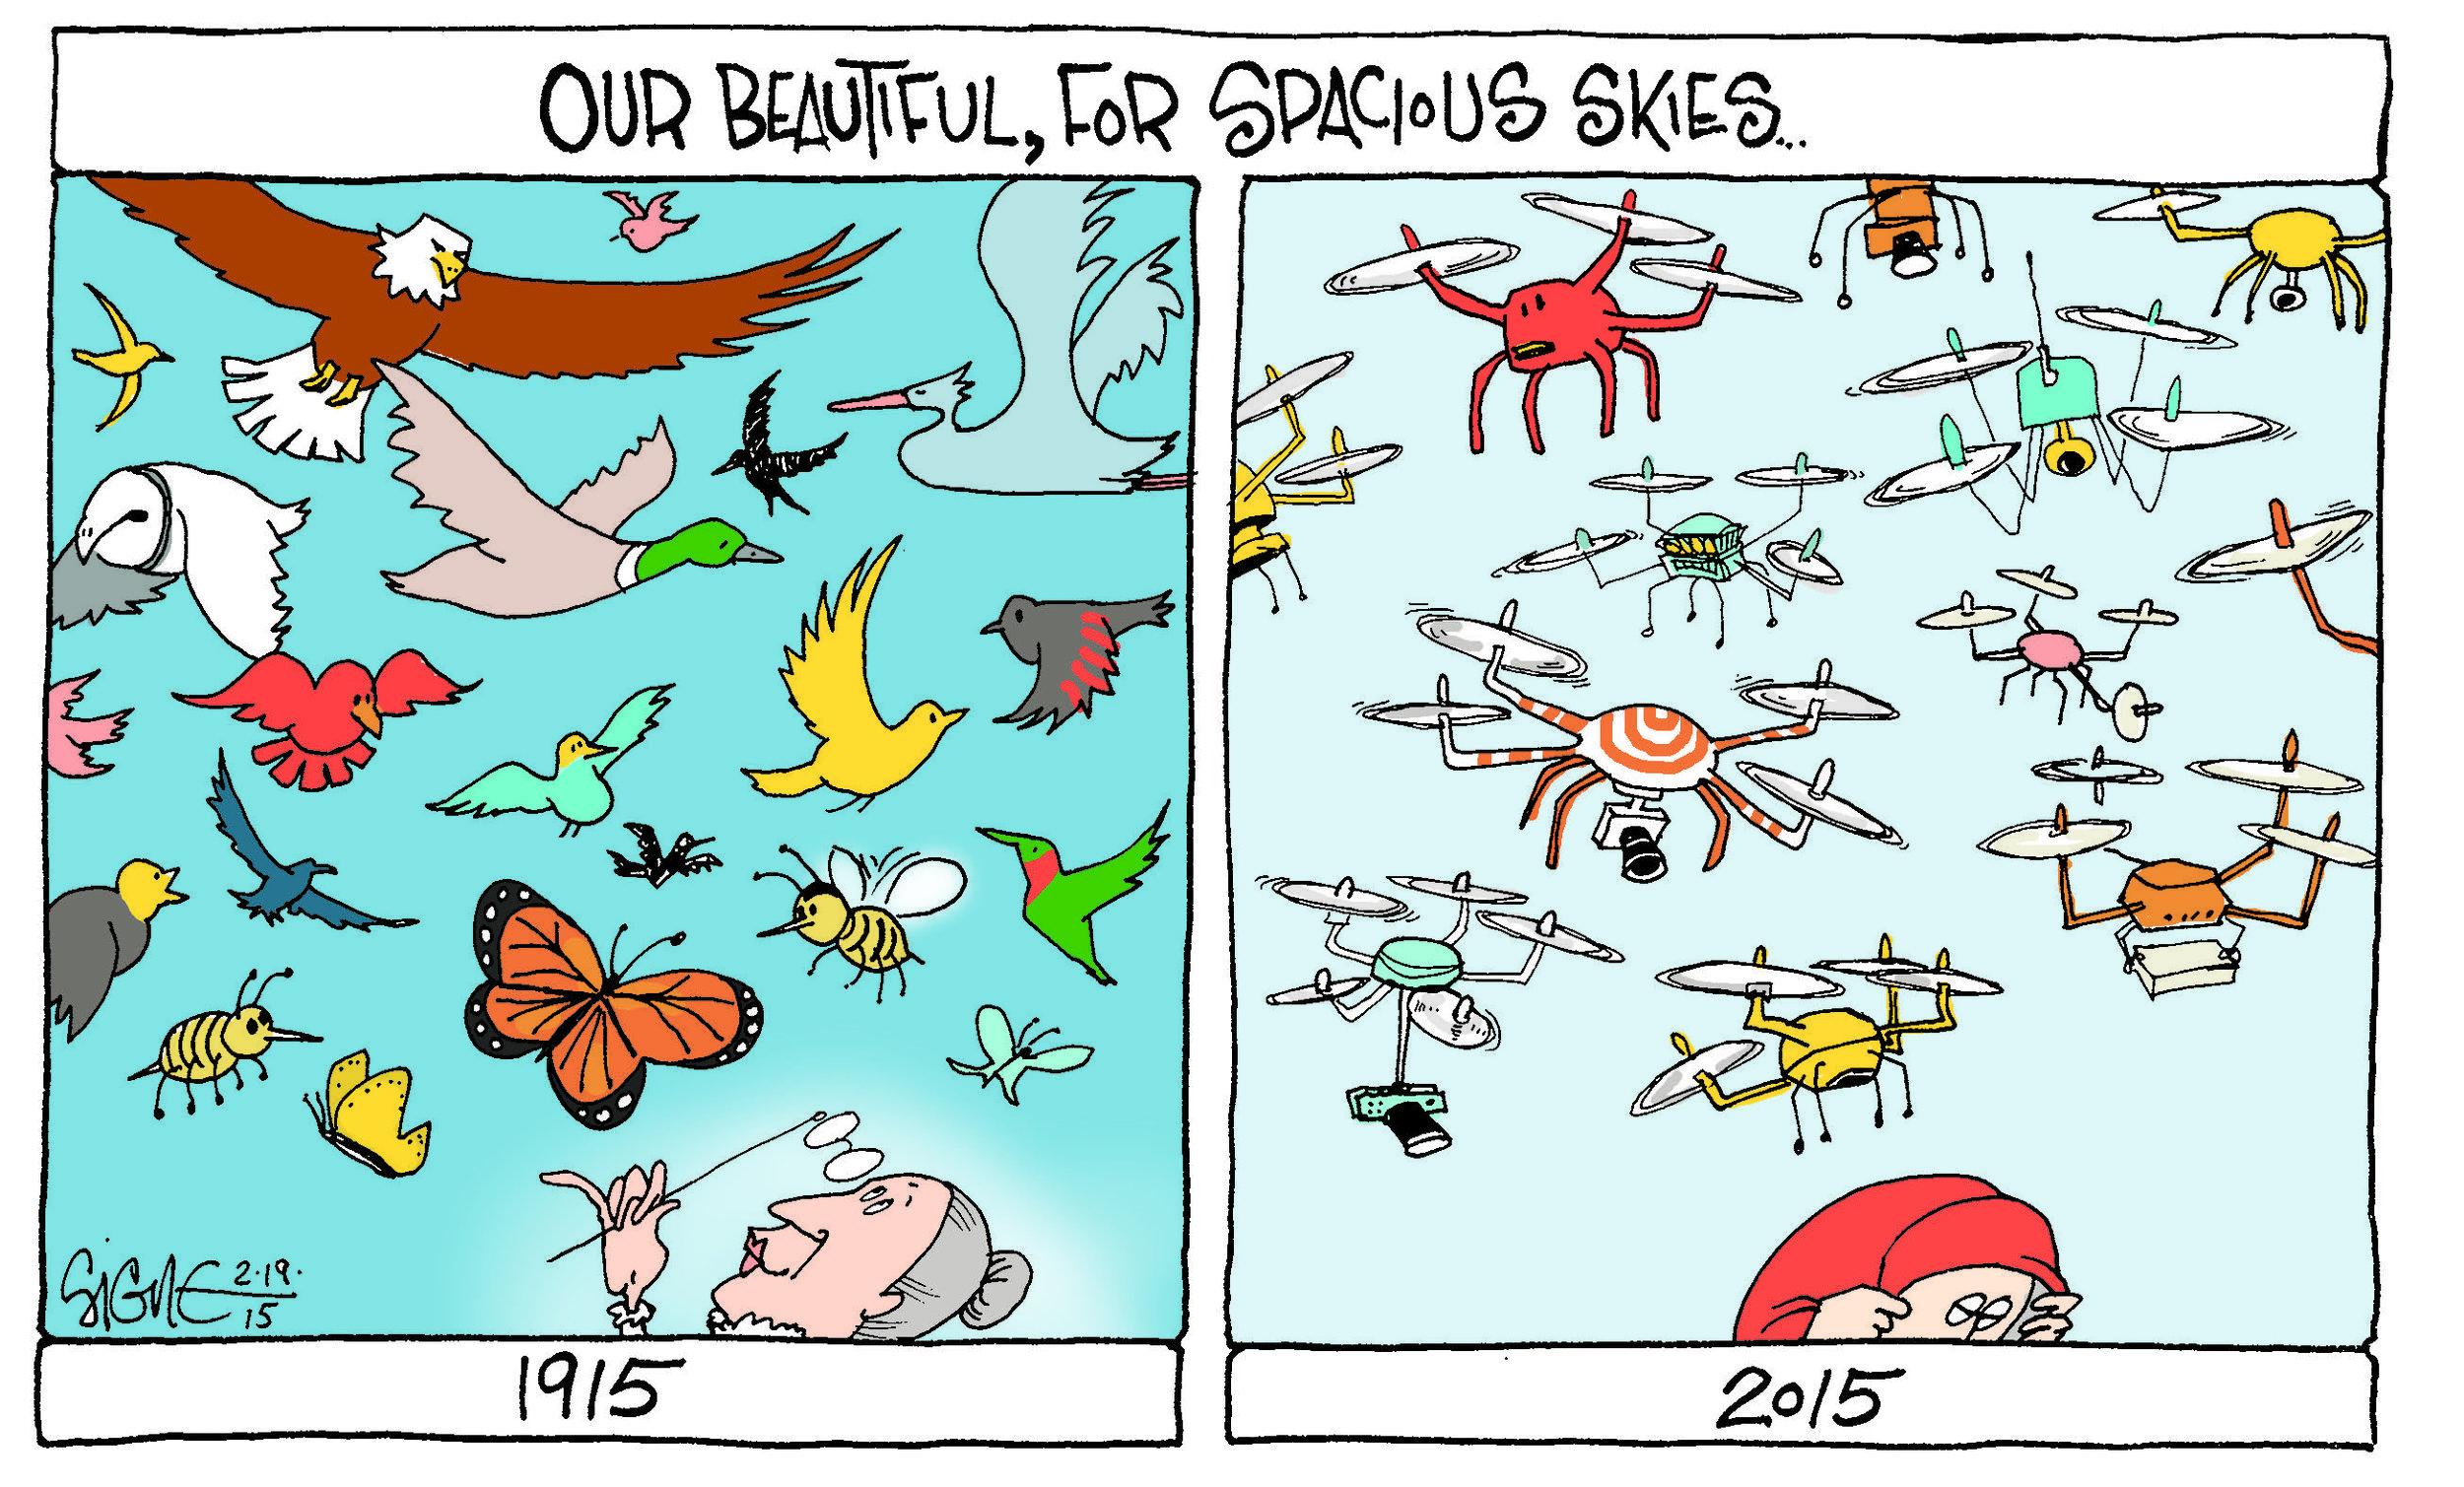 9. 02-19-15 Drones.jpg